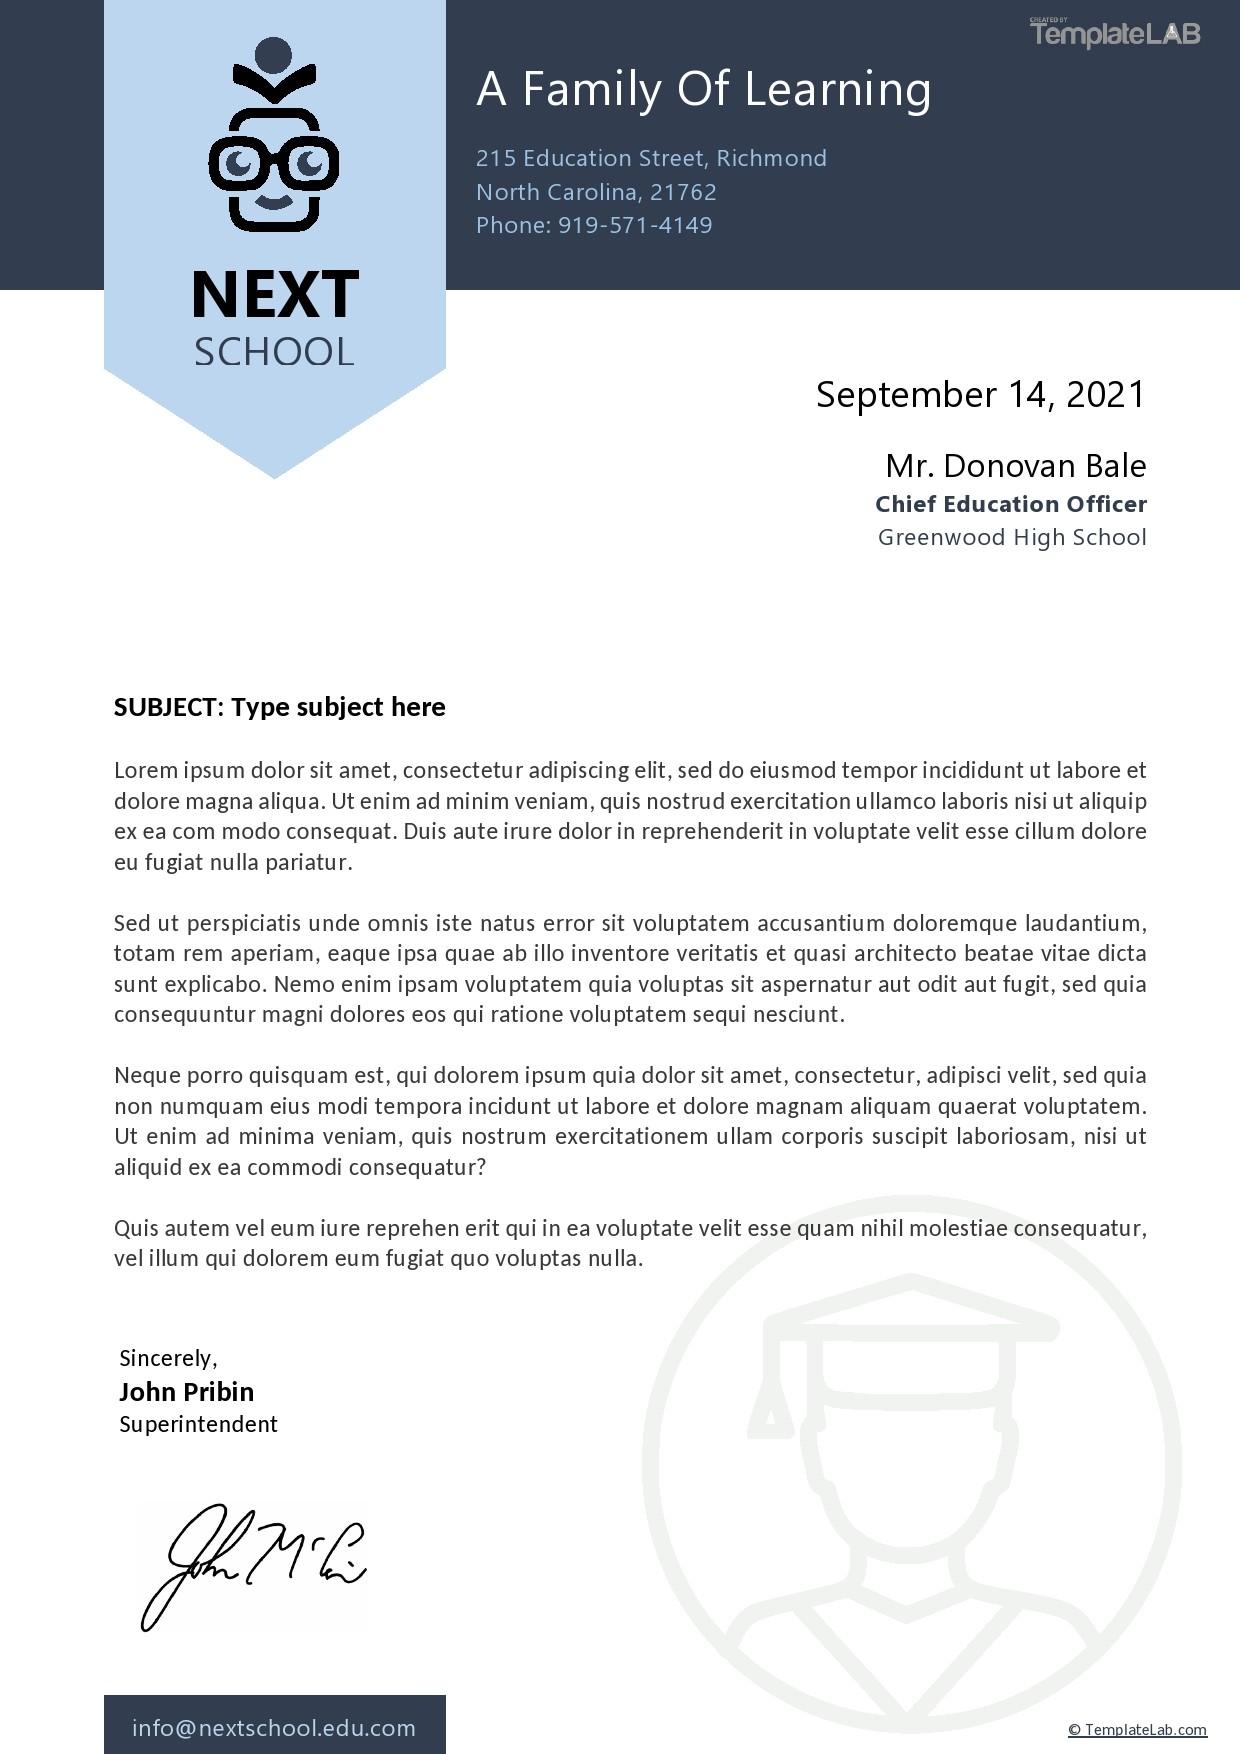 Free School Letterhead Template - TemplateLab.com